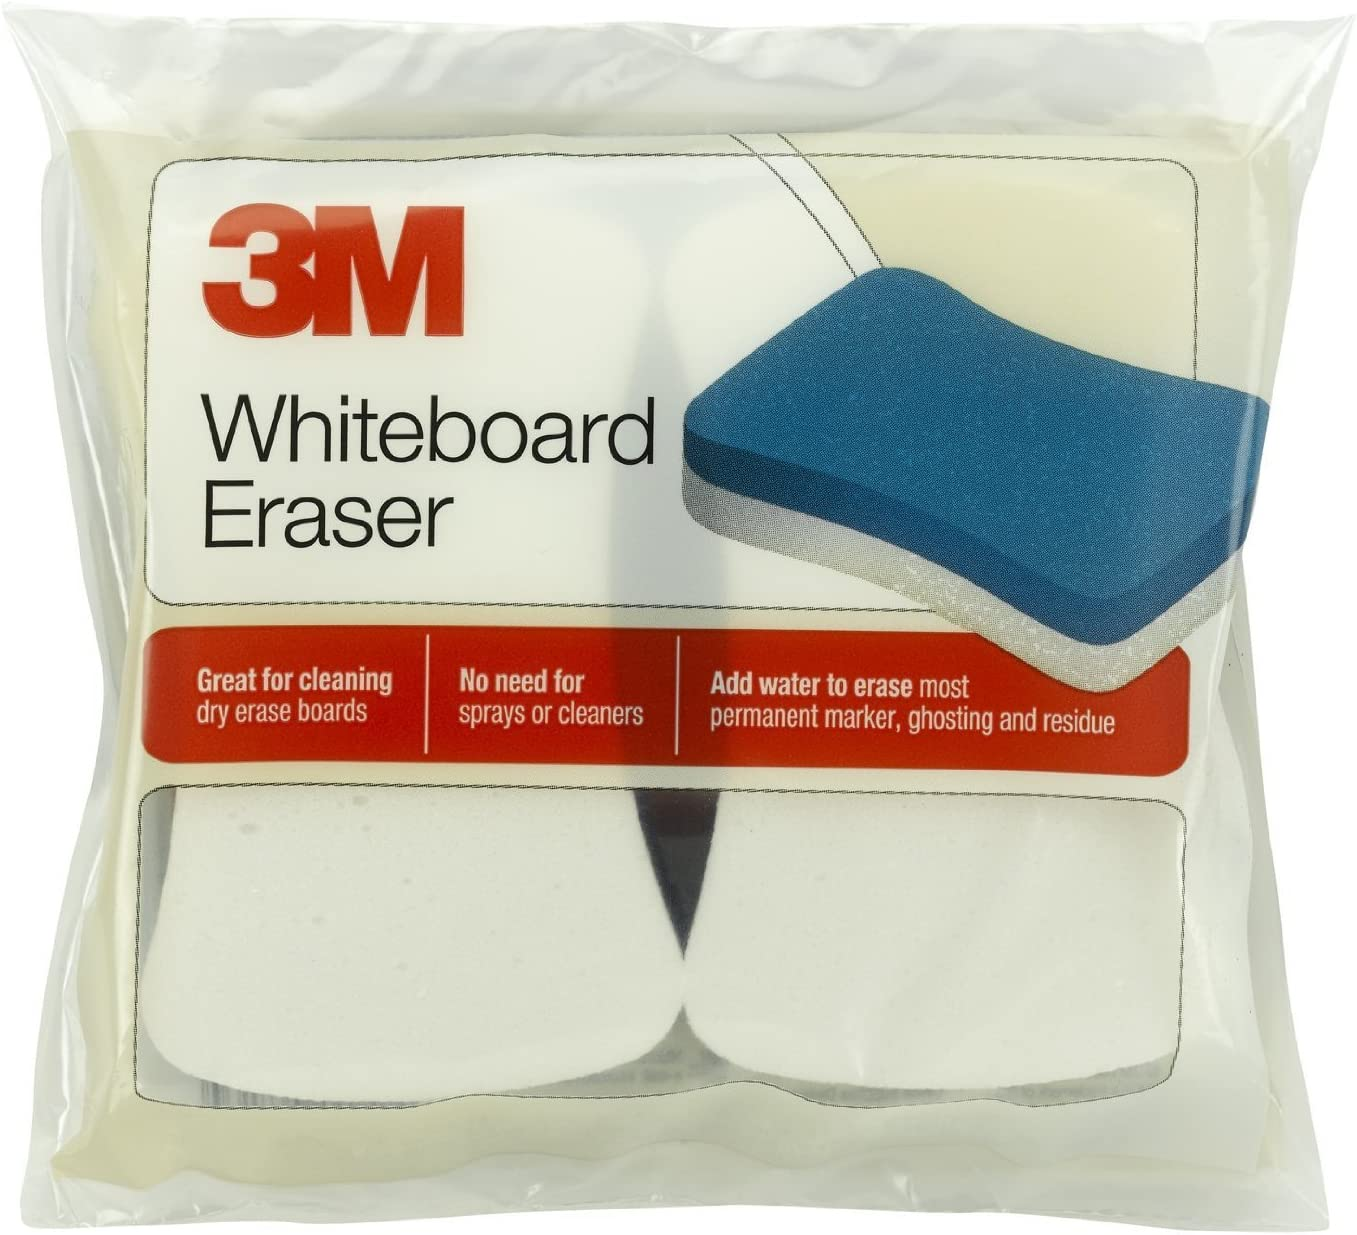 3M 581WBE Whiteboard Eraser Pads, 5-Inch x3-Inch, 2/PK, White/Blue